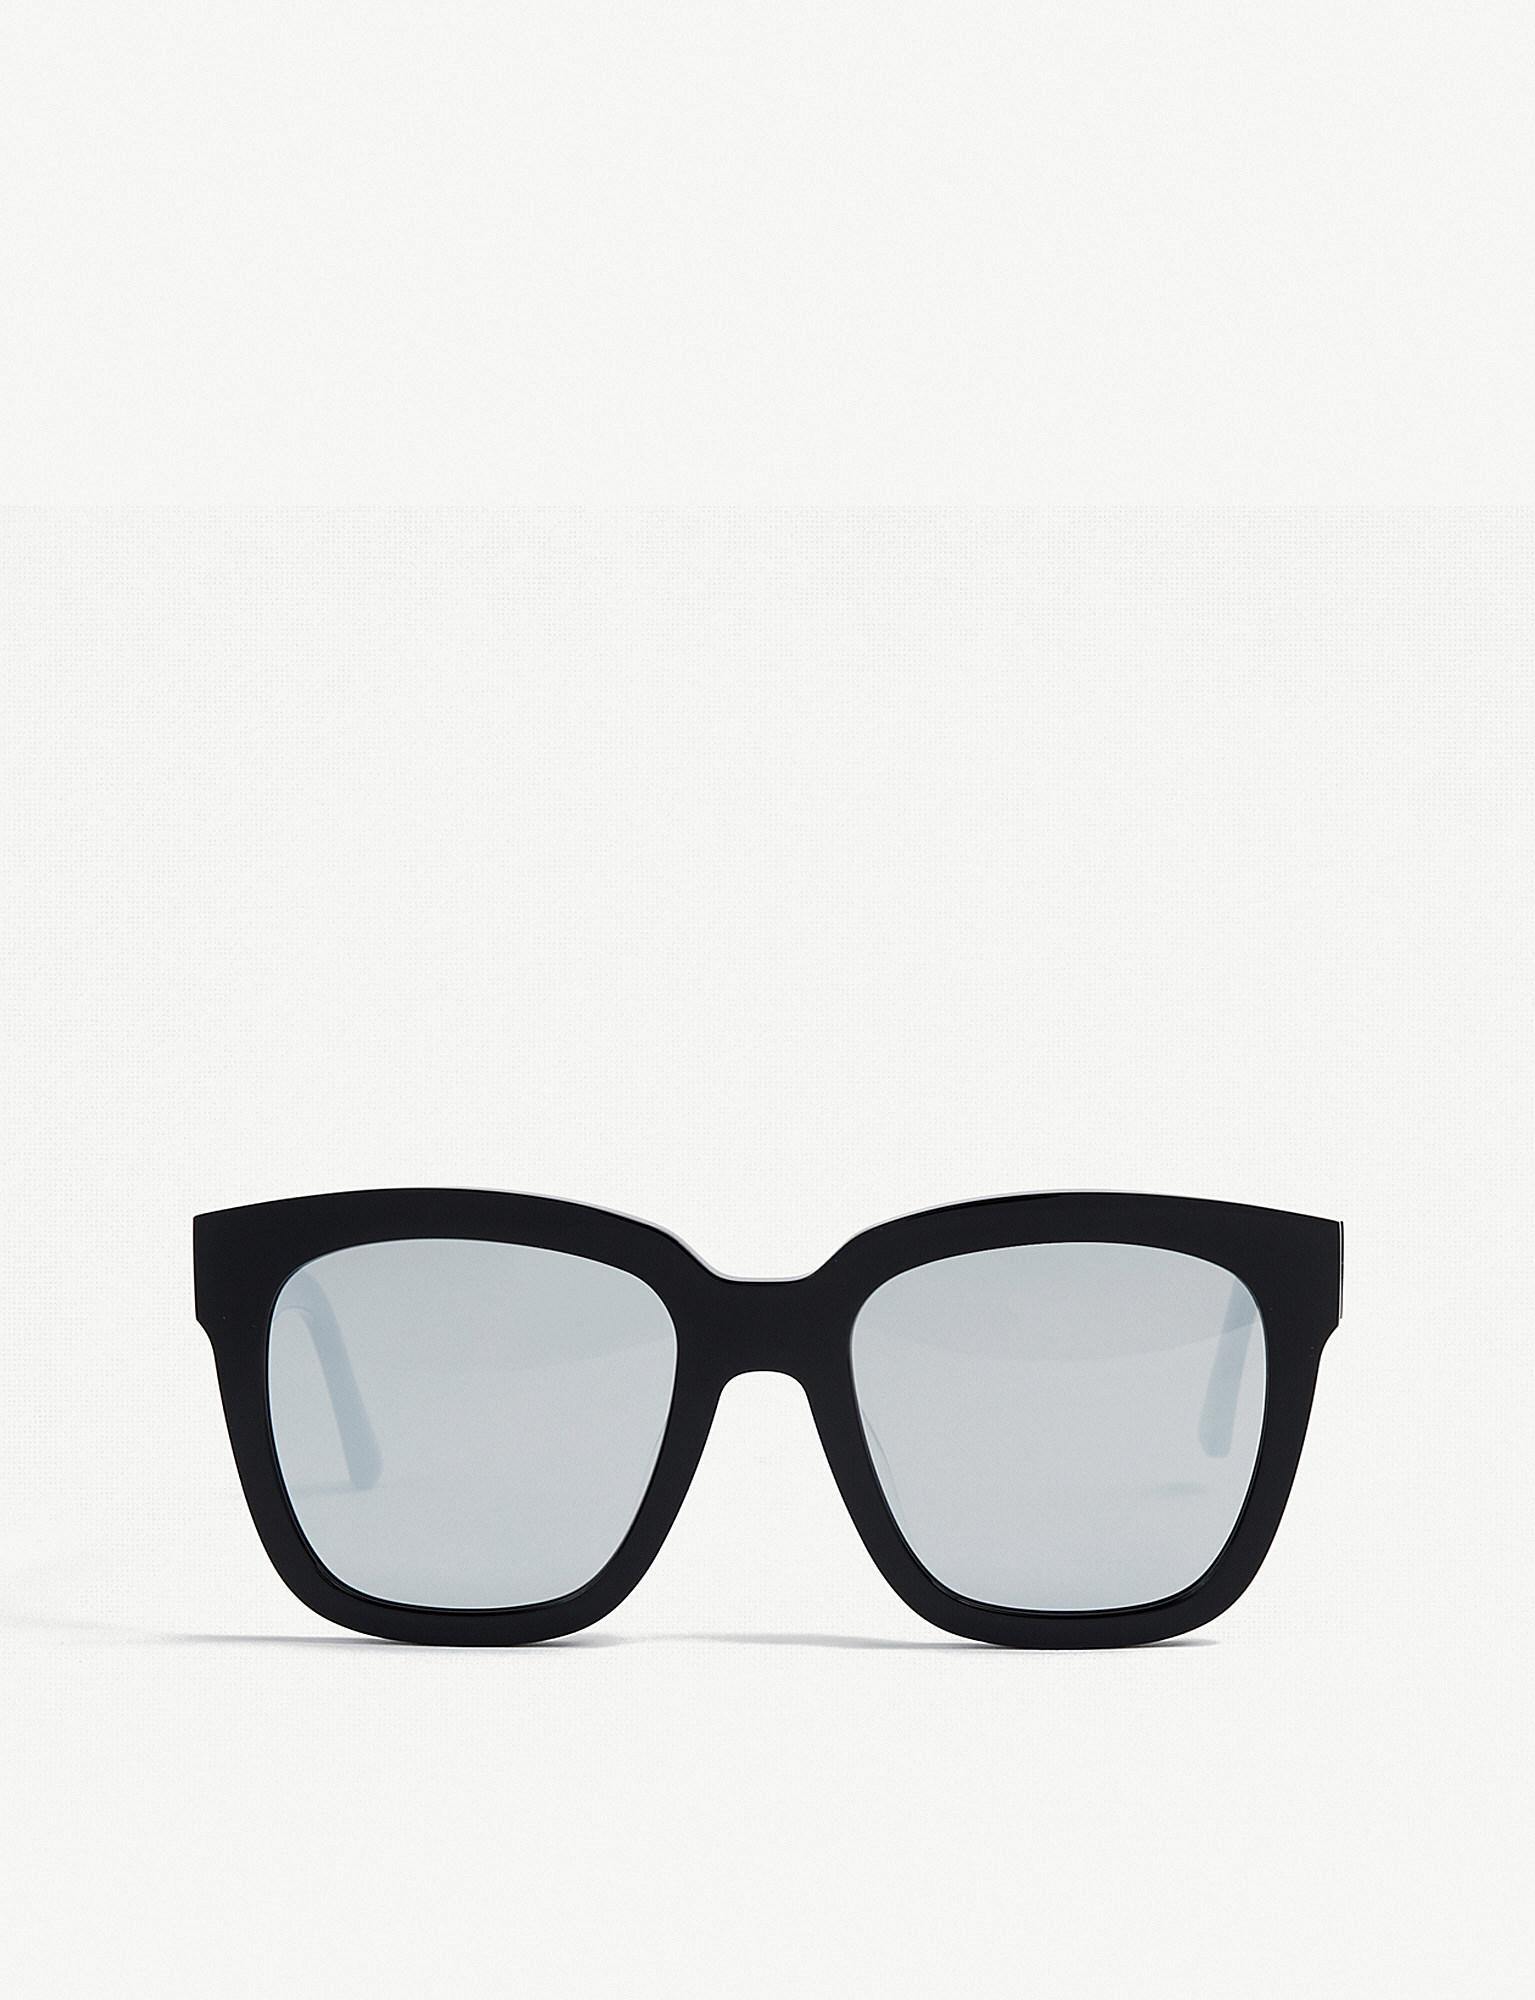 ad49a47520 Gentle Monster Dreamer Hoff Mirrored Acetate Sunglasses in Black - Lyst